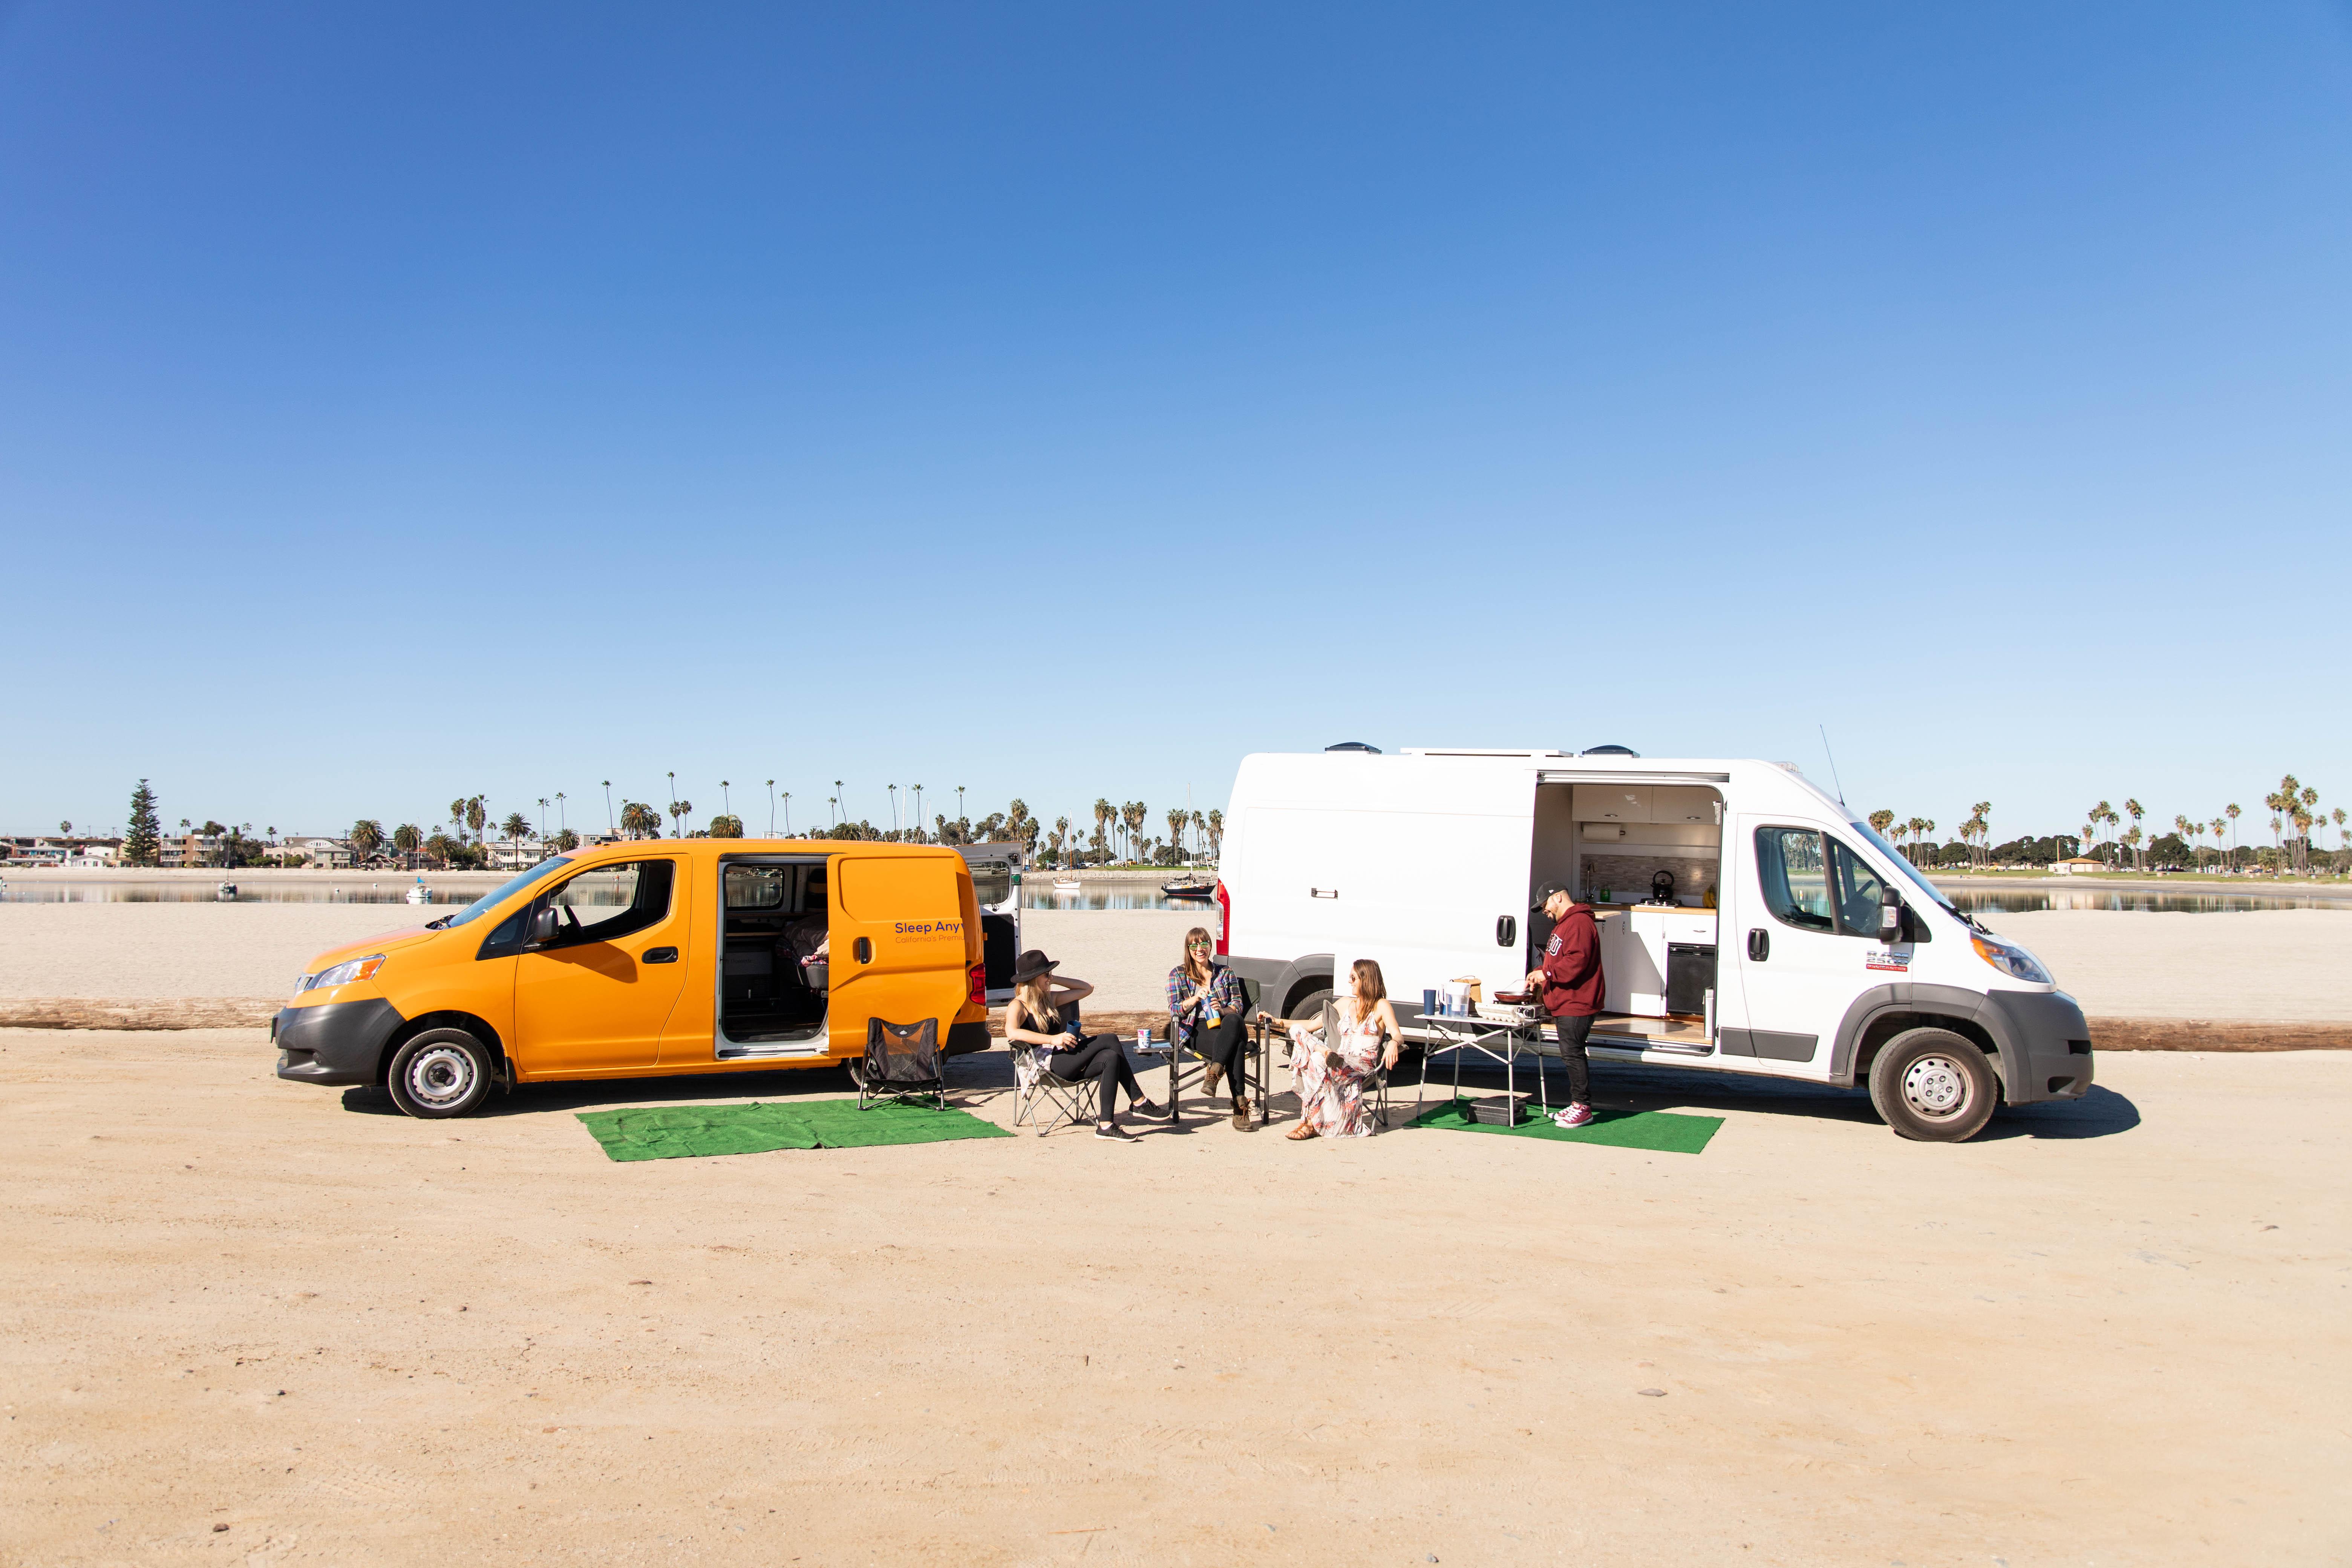 https://techcrunch.com/wp-content/uploads/2019/01/Outdoorsy-San-Diego-SD-Campervans-33.jpg